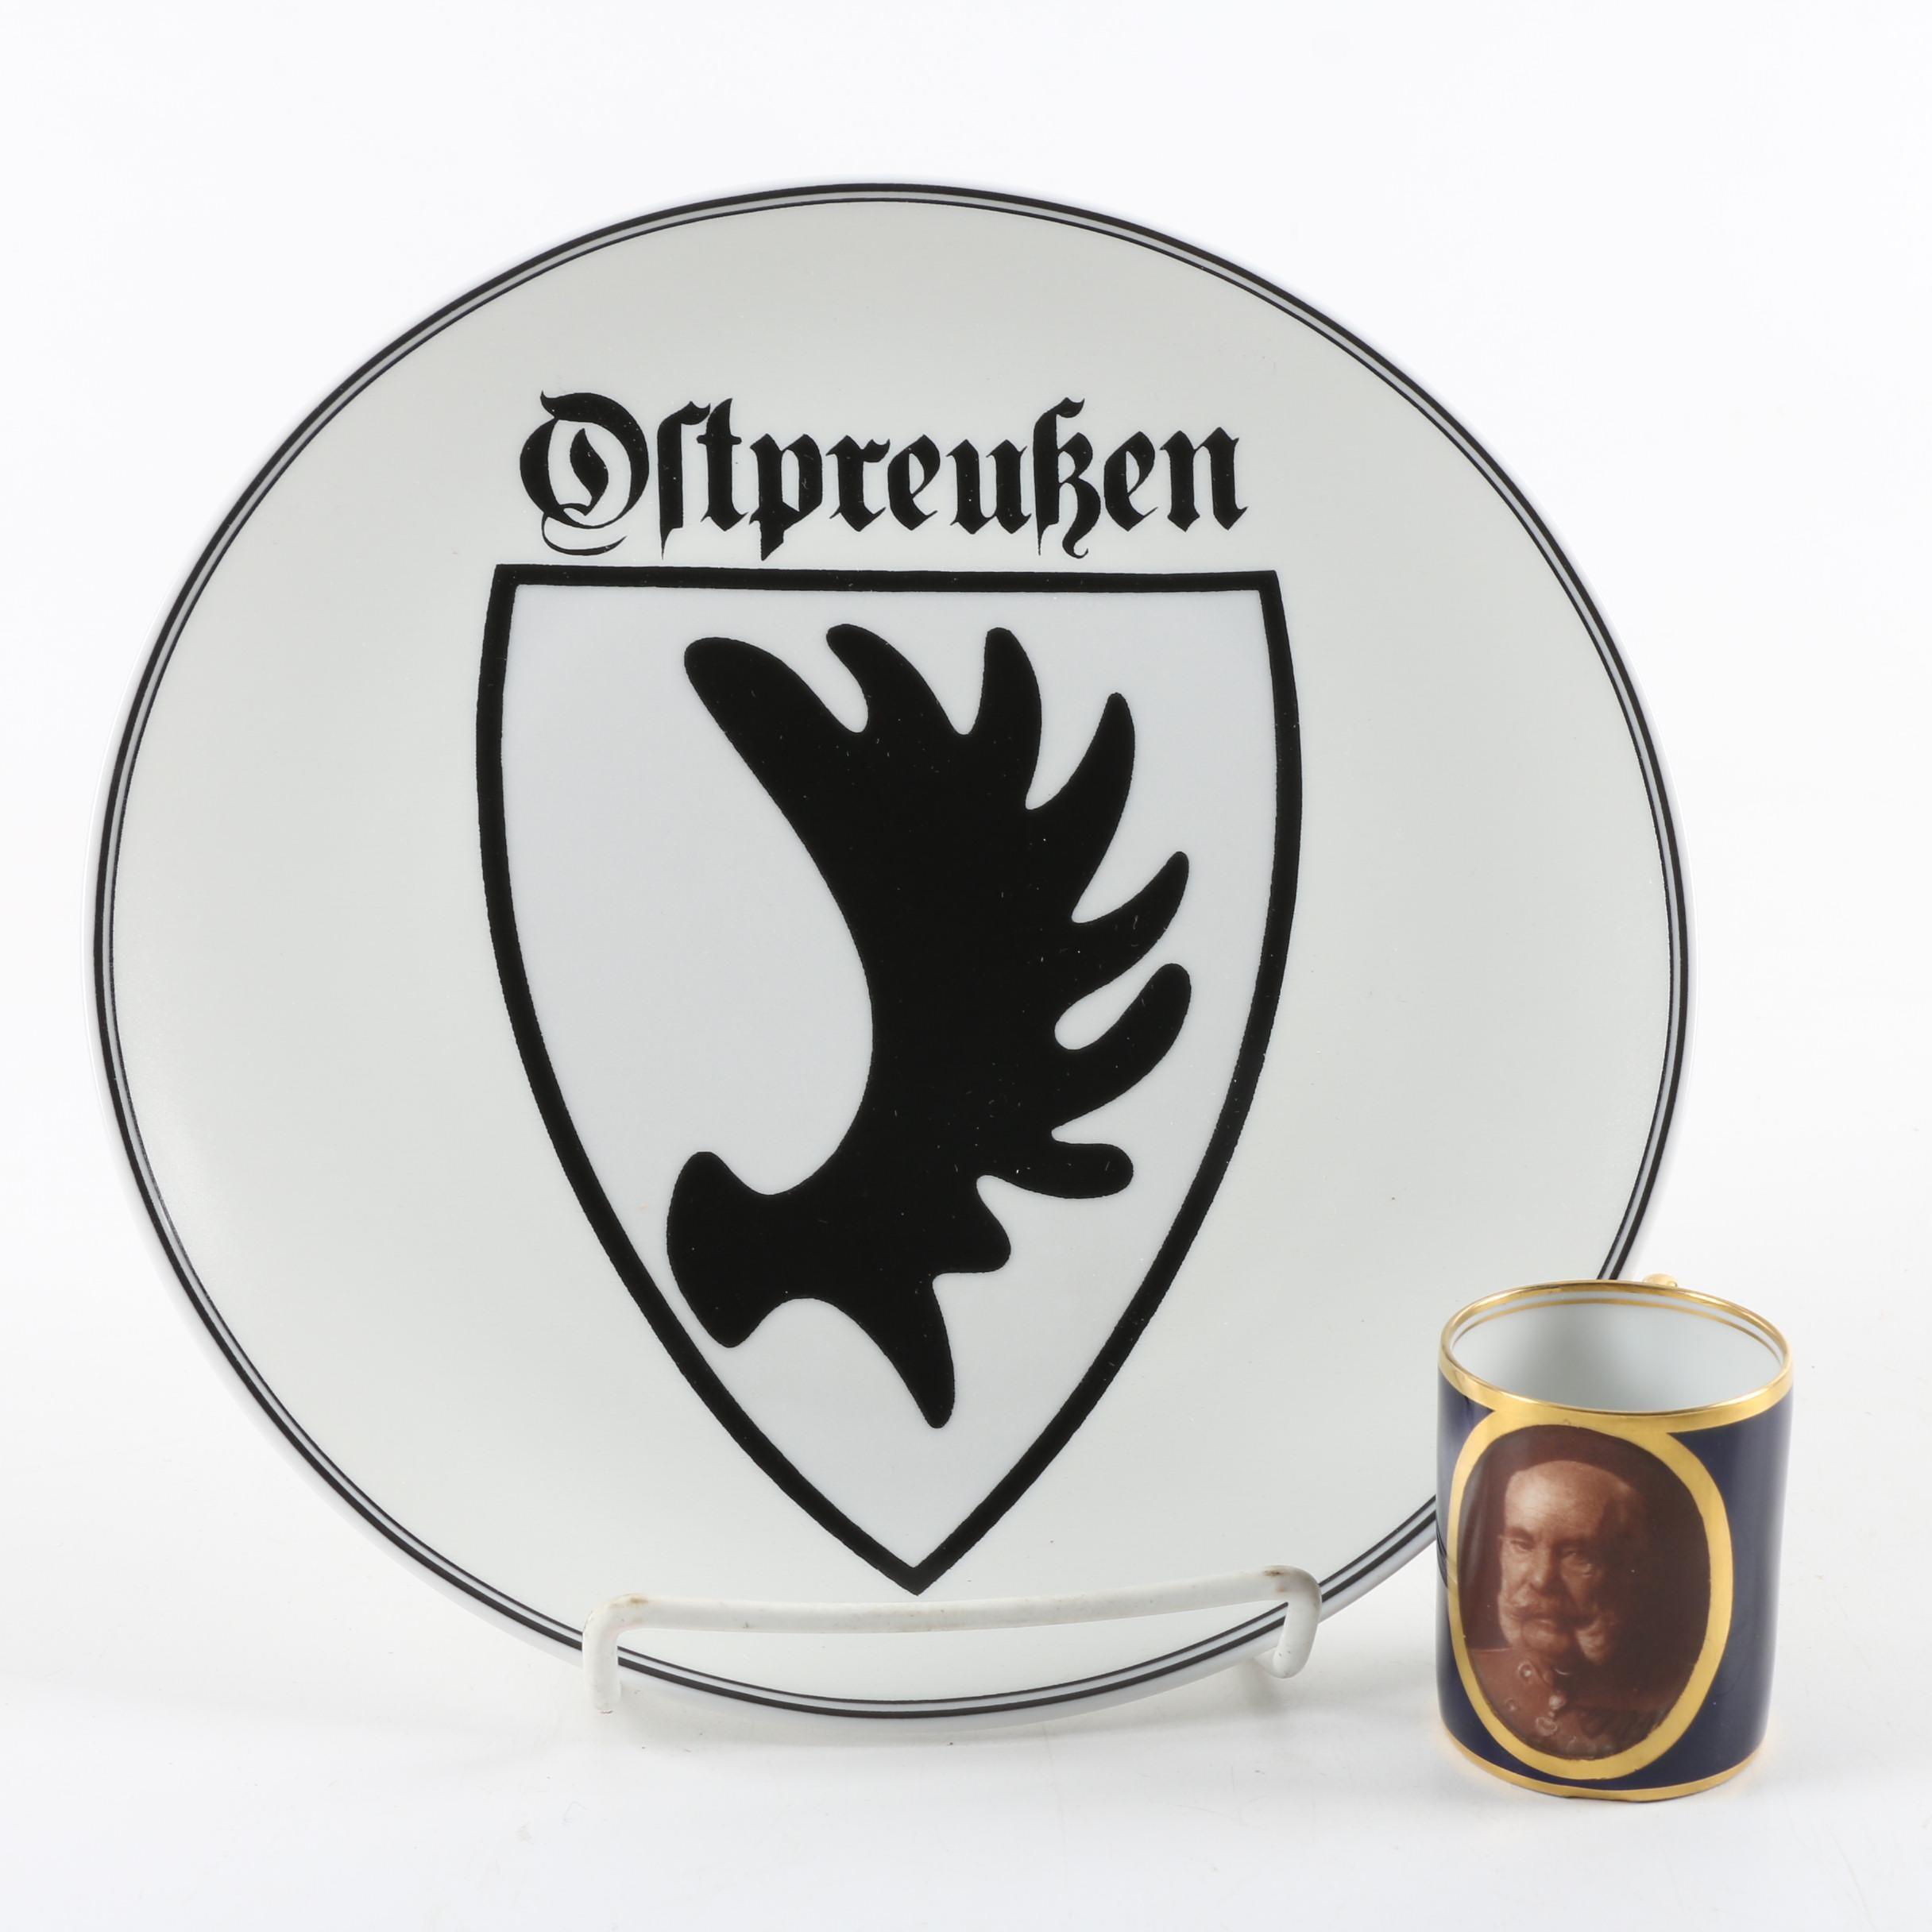 Ludwigsburg Porcelain Demitasse and Ostprußen Plate